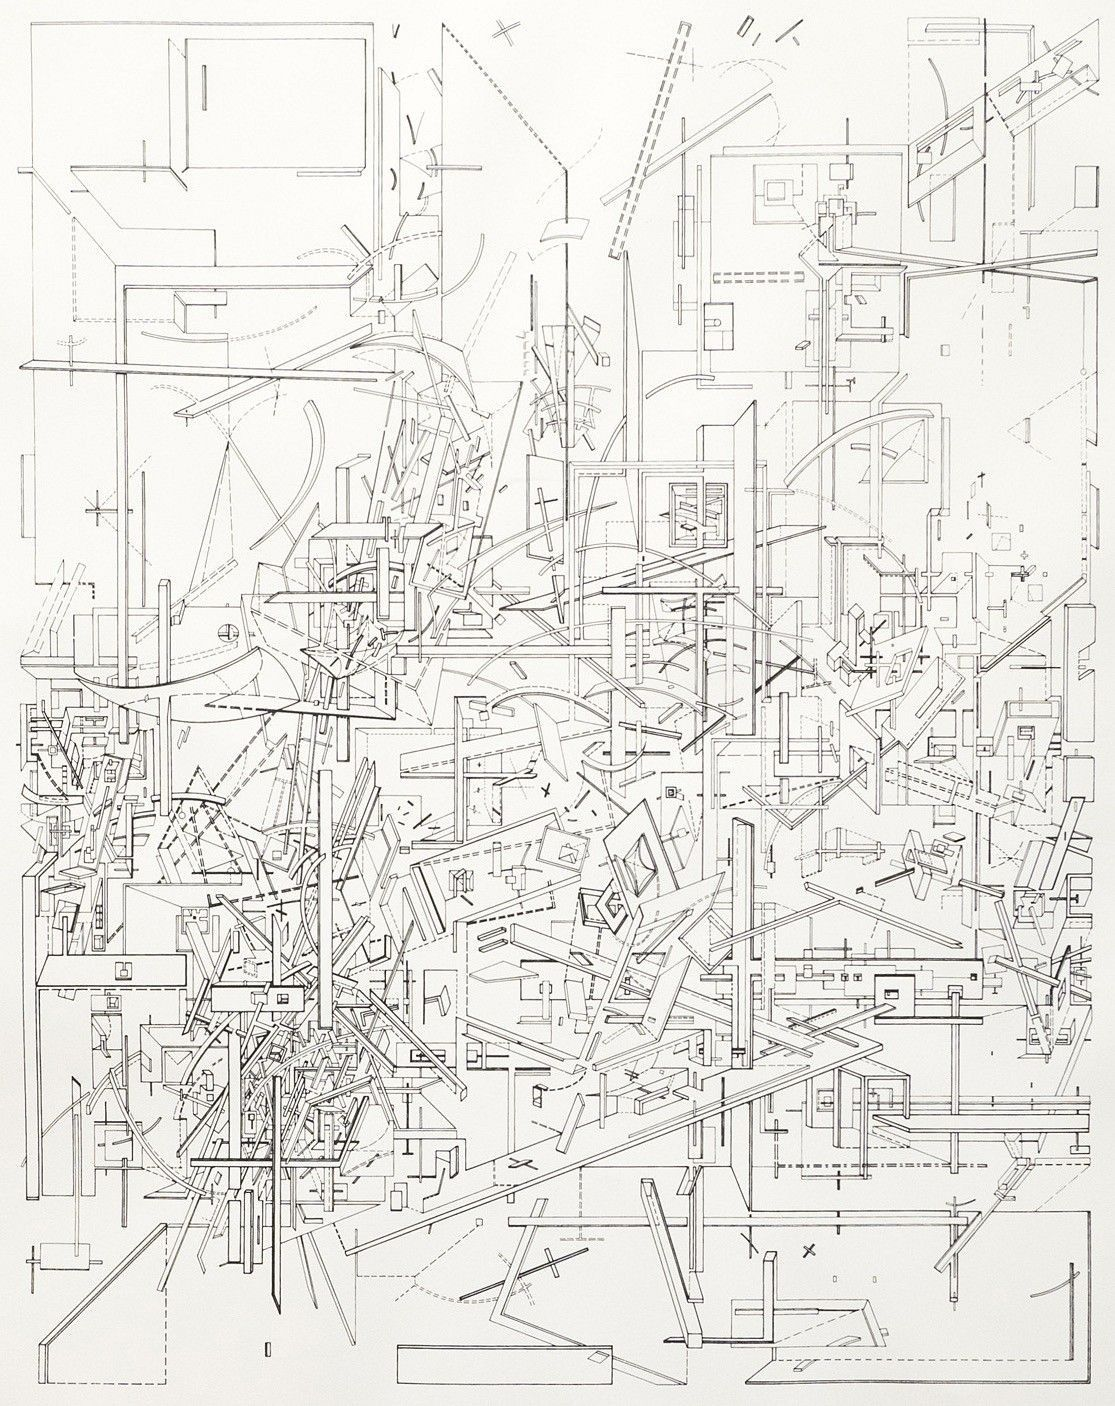 Pin By Orbitalkai On Art Daniel Libeskind Paper Architecture